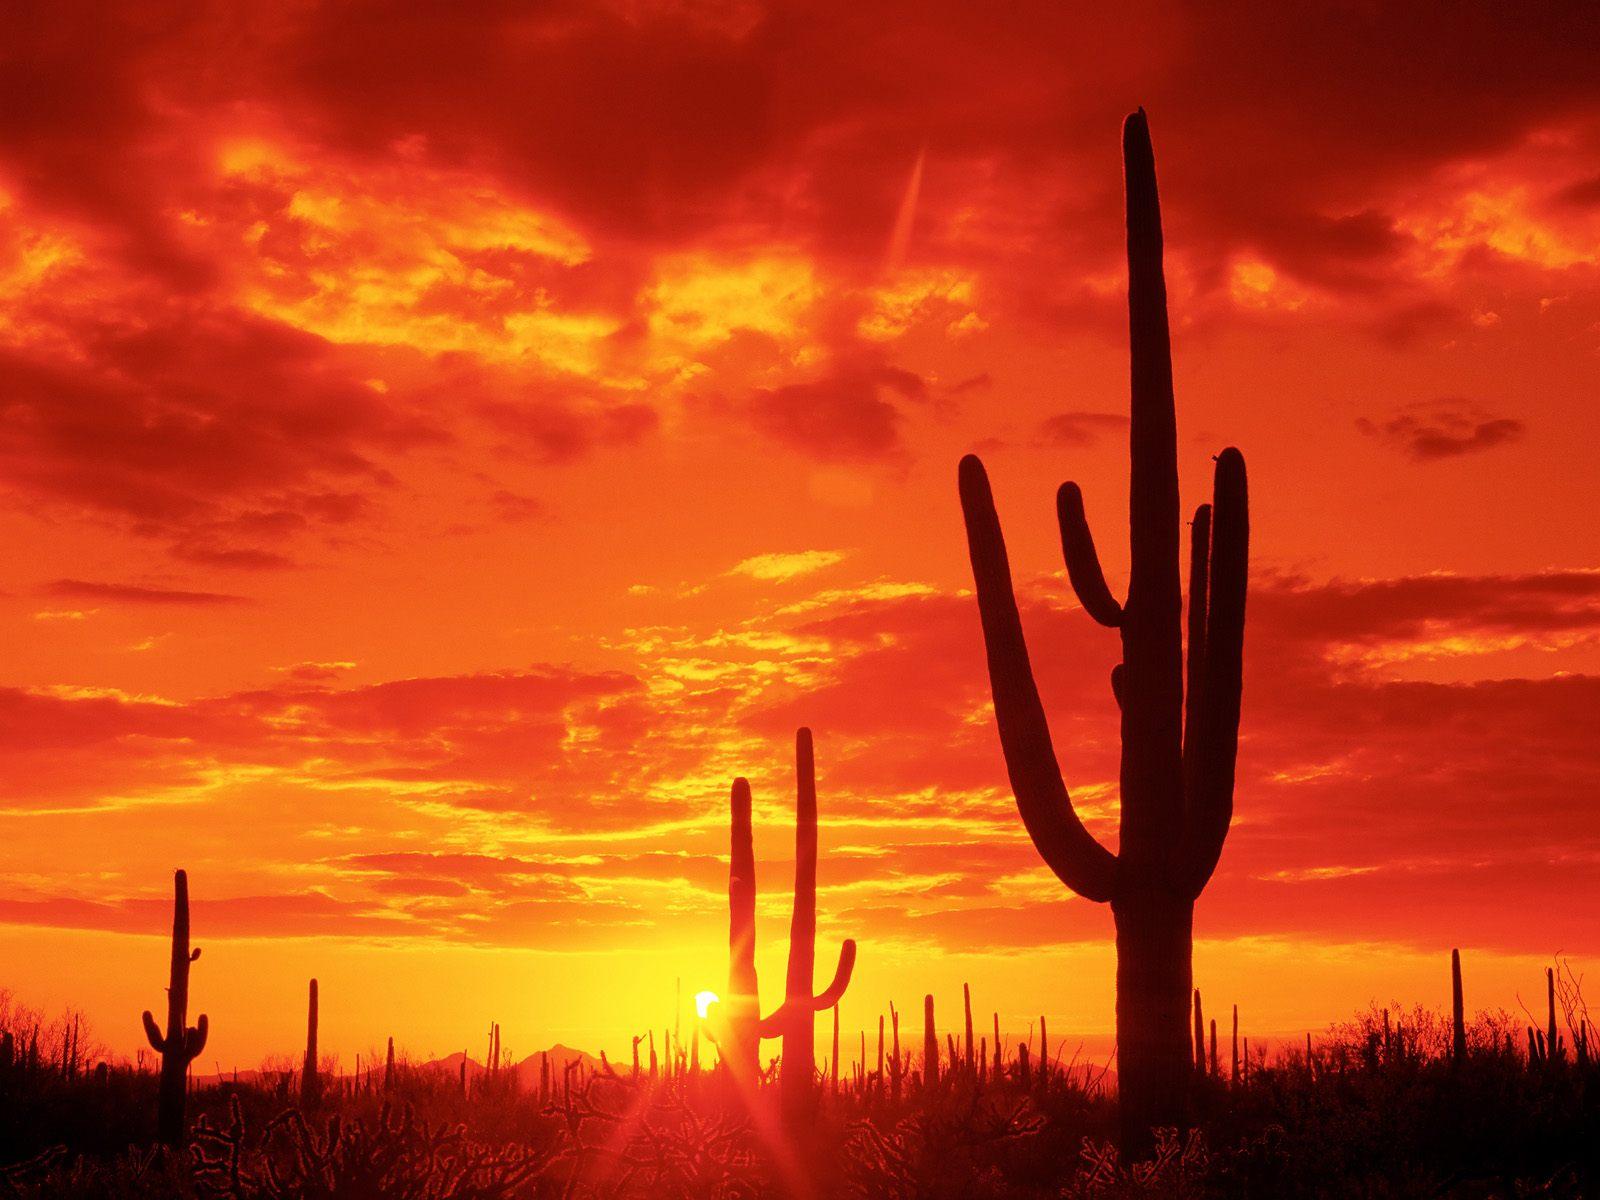 http://2.bp.blogspot.com/-_JplQ-_FBKs/T2zqwEqZoHI/AAAAAAAAD1c/_zVUuvdfEsU/s1600/Burning-Sunset-Saguaro-National-Park-Arizona.jpg